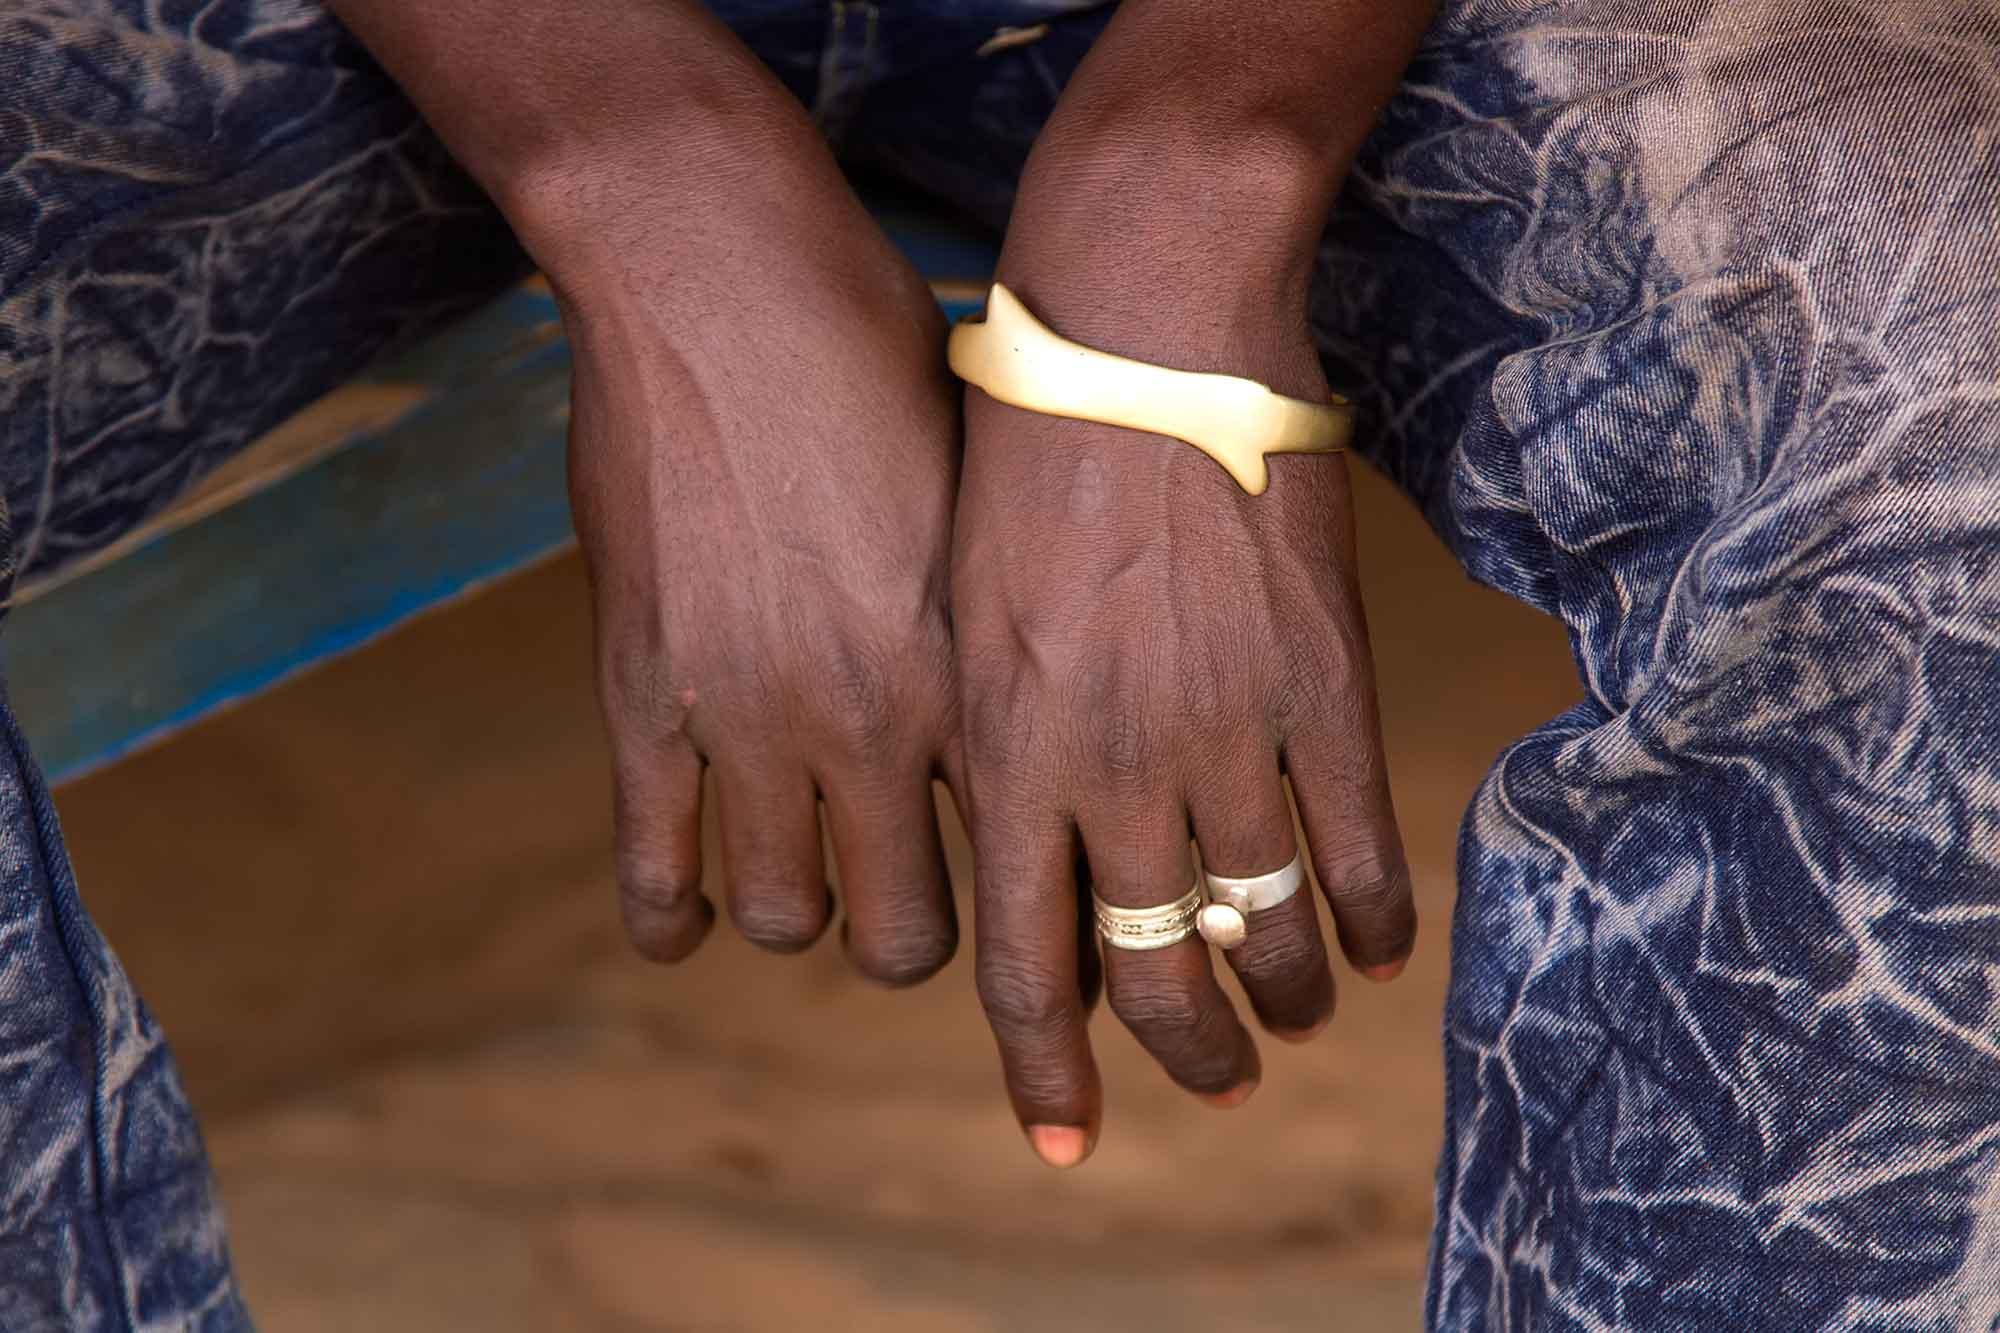 hands-of-a-working-man-bobo-dioulasso-burkina-faso-africa